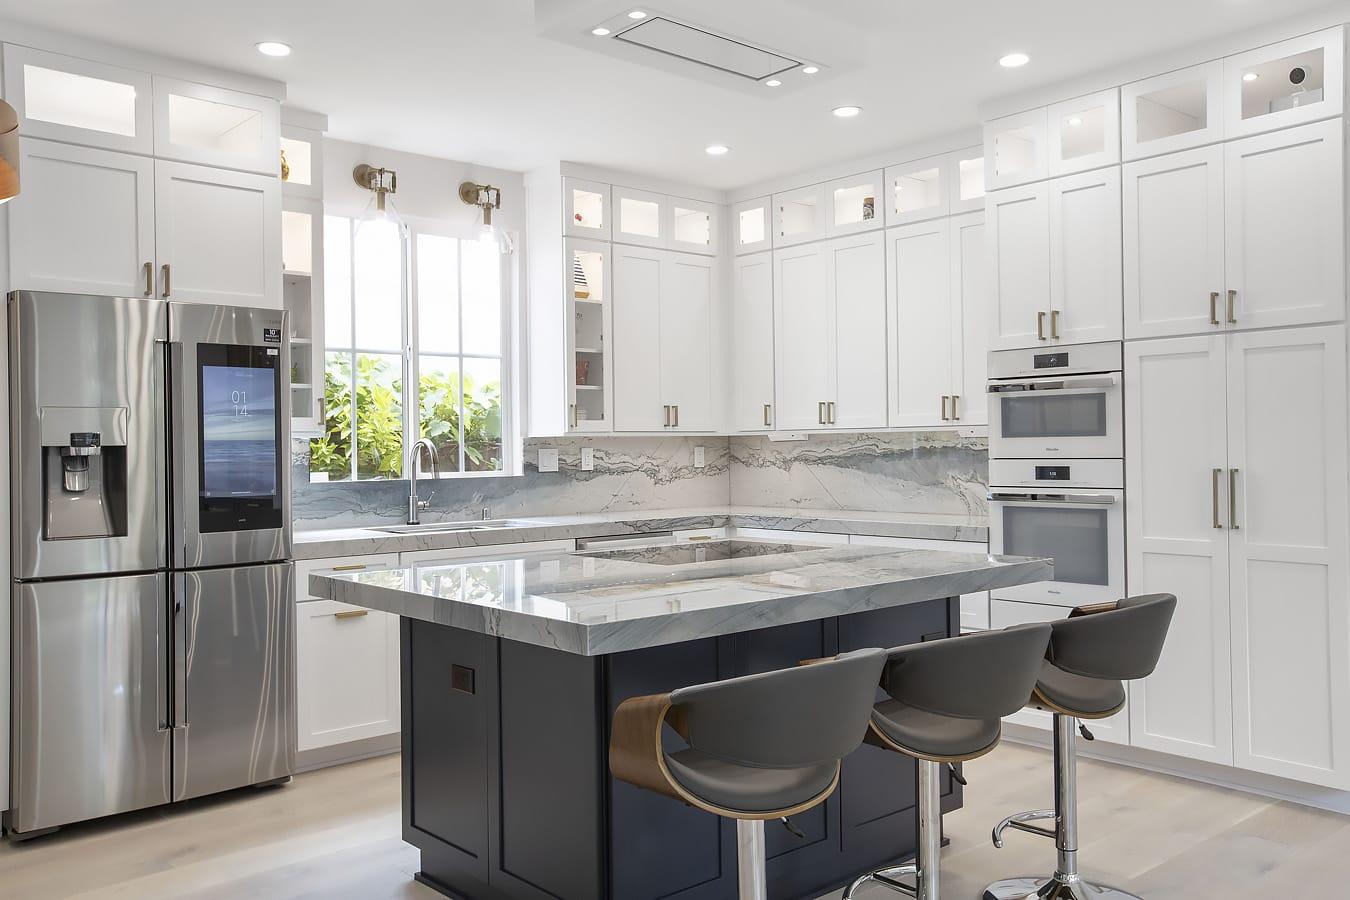 SHI-Kitchen Remodel